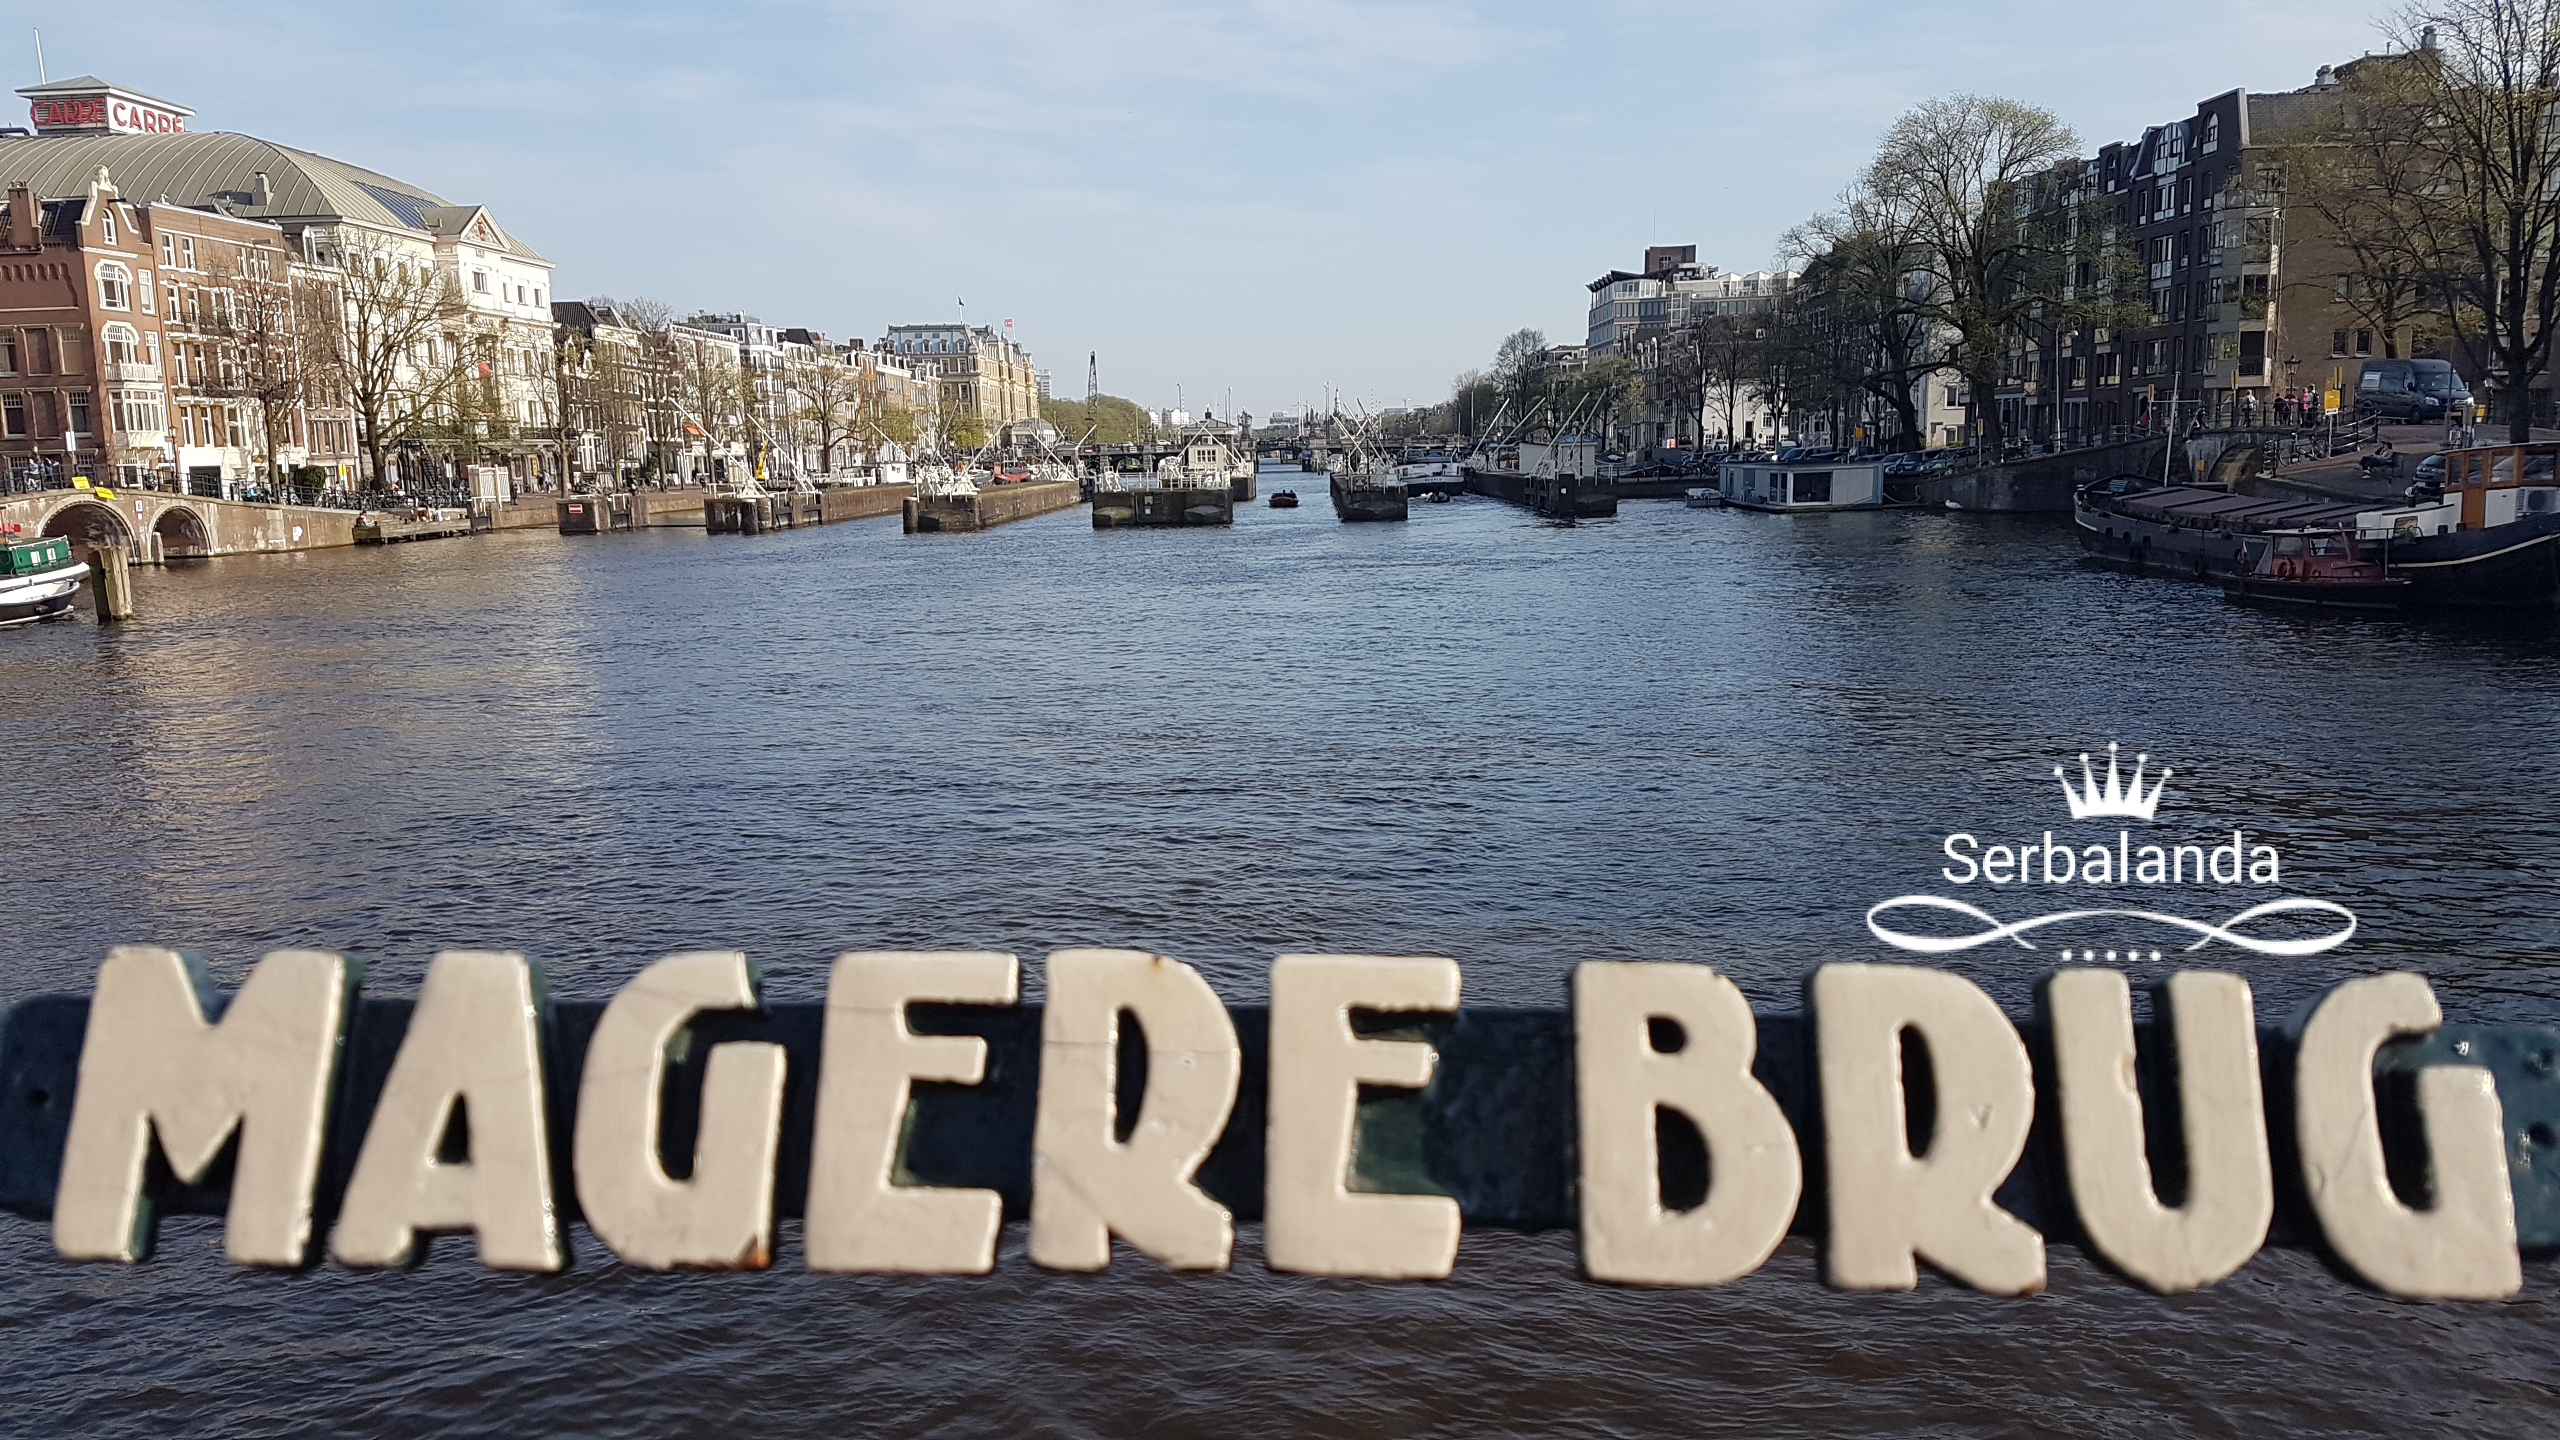 Jembatan Kayu di Amsterdam, Jembatan Tertua, Lokasi Unique di Amsterdam, Kanal-kanal Amsterdam, Rumah-rumah Kanal. Serbalanda, Pemandu Wisata Orang Indonesia